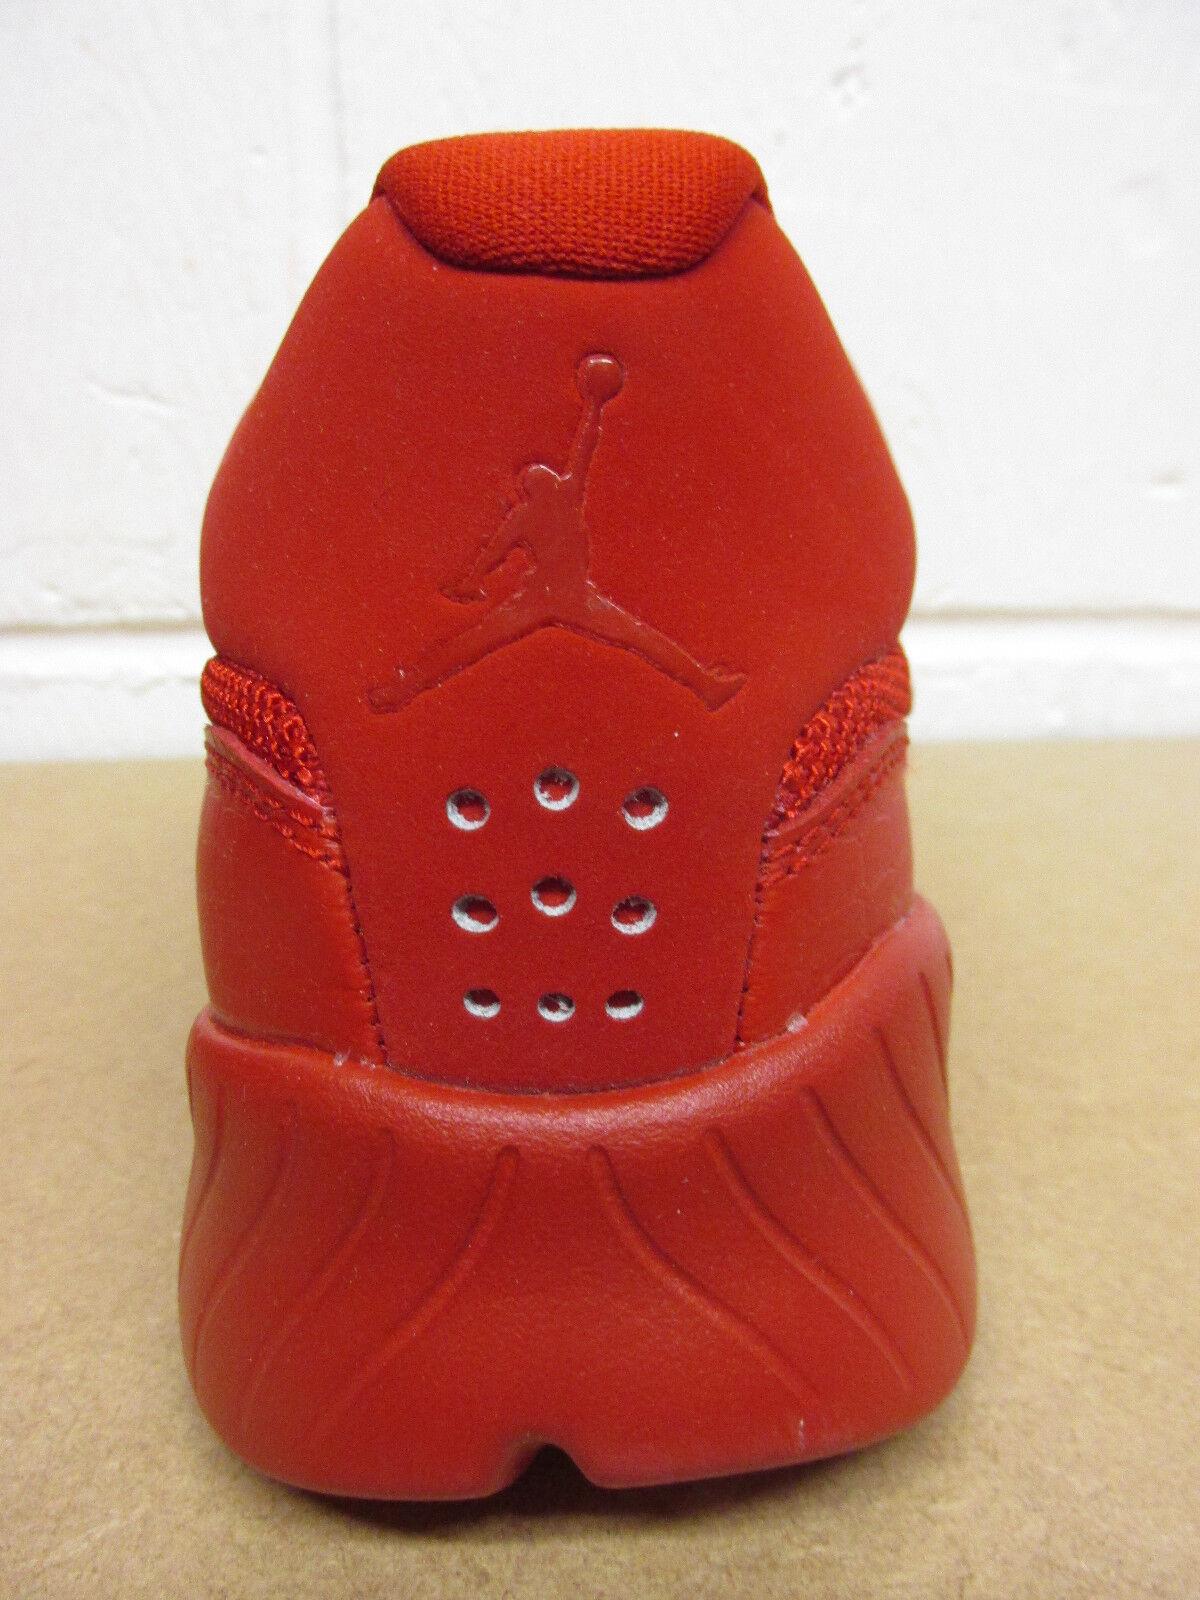 Nike Air Basketball Jordan J23 Bg Basketball Air Turnschuhe 854558 600 Turnschuhe a8e13c